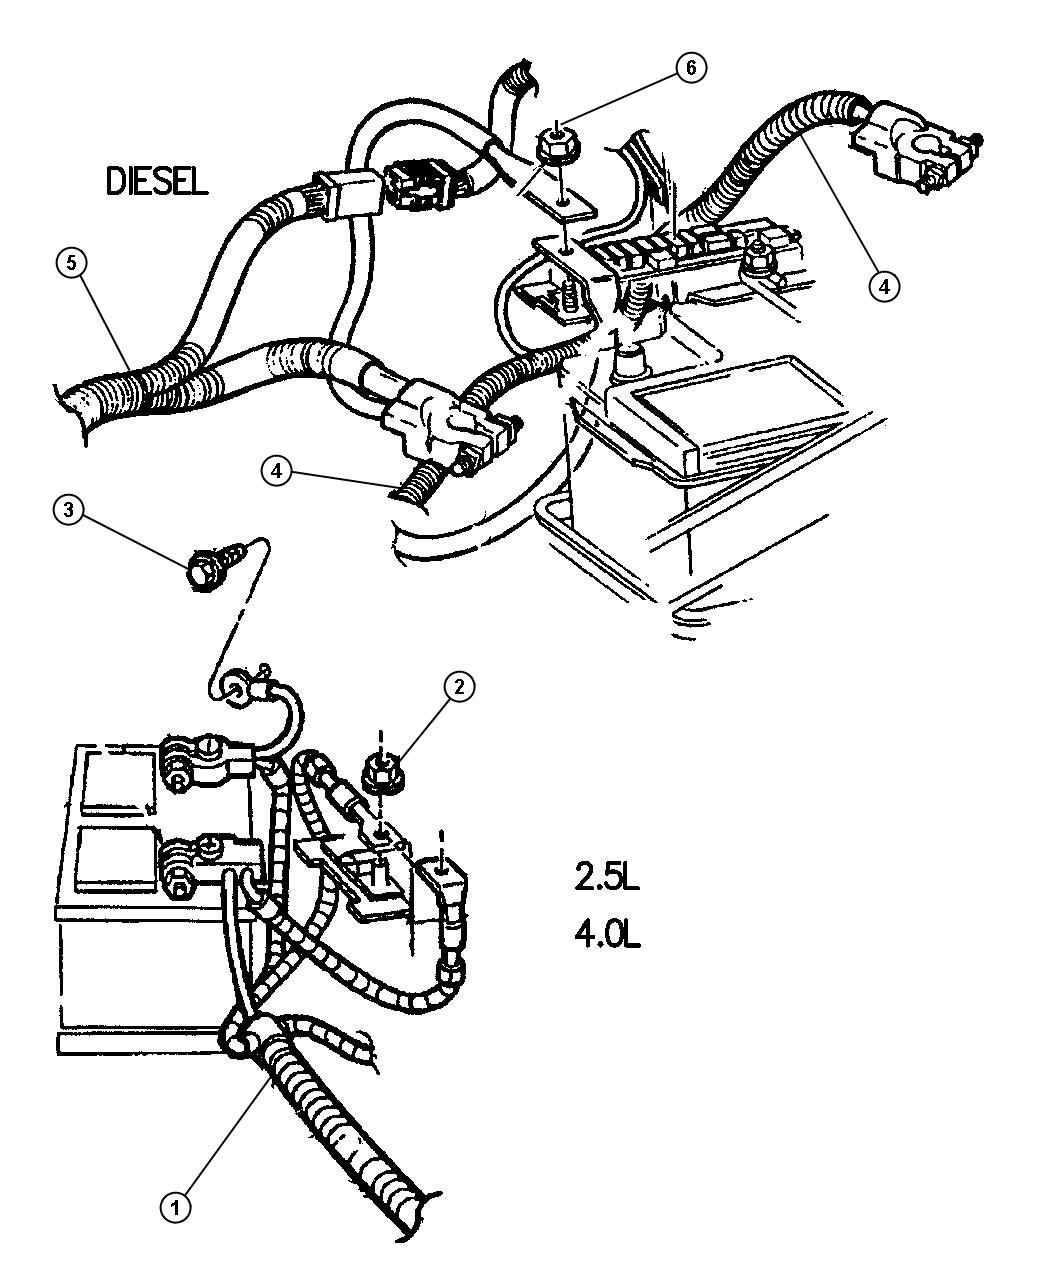 Chrysler 200 Wiring. Battery. Frontla, floorargentina